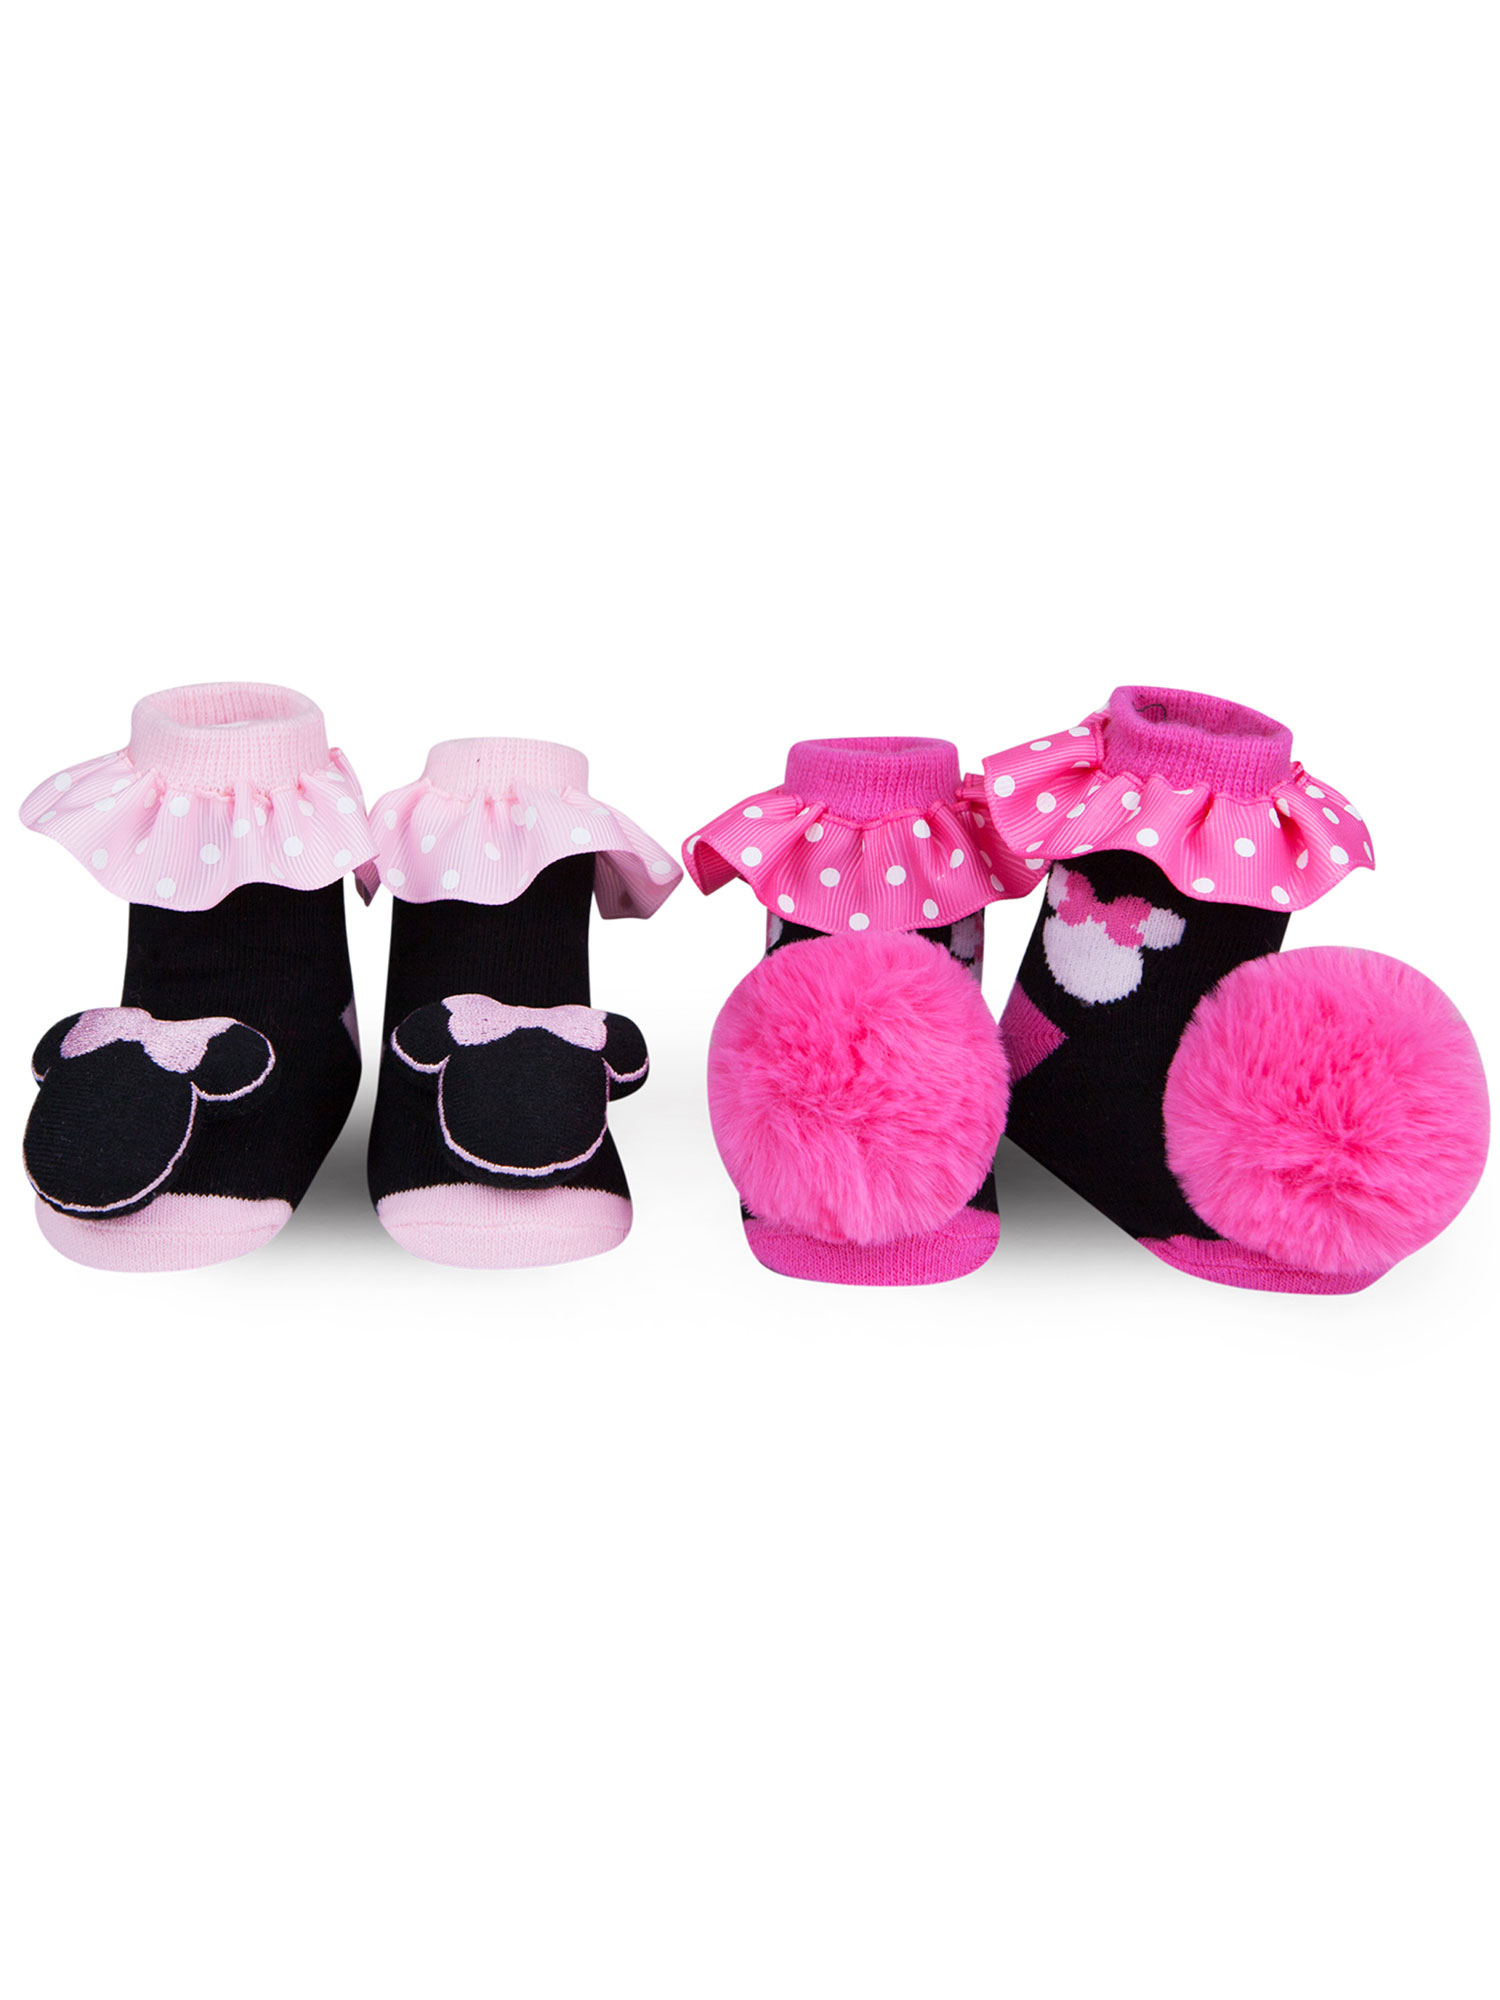 Disney Baby Minnie Mouse Ruffle Socks Newborn Pom Pom Foot Rattles 0-12 Months Pink